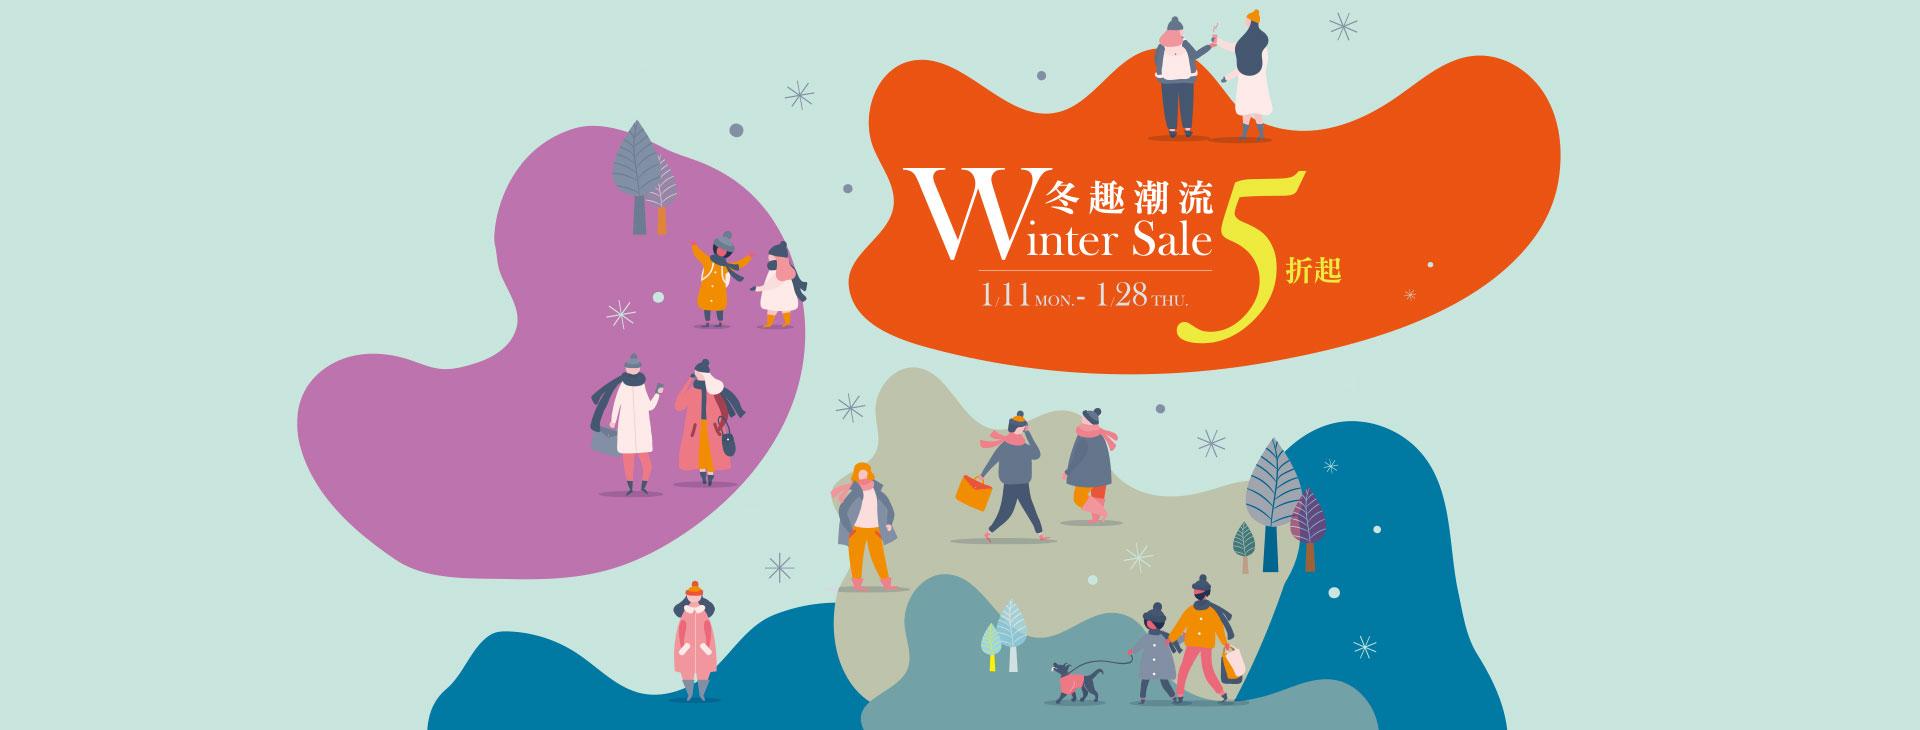 冬趣潮流 WINTER SALE 5折起